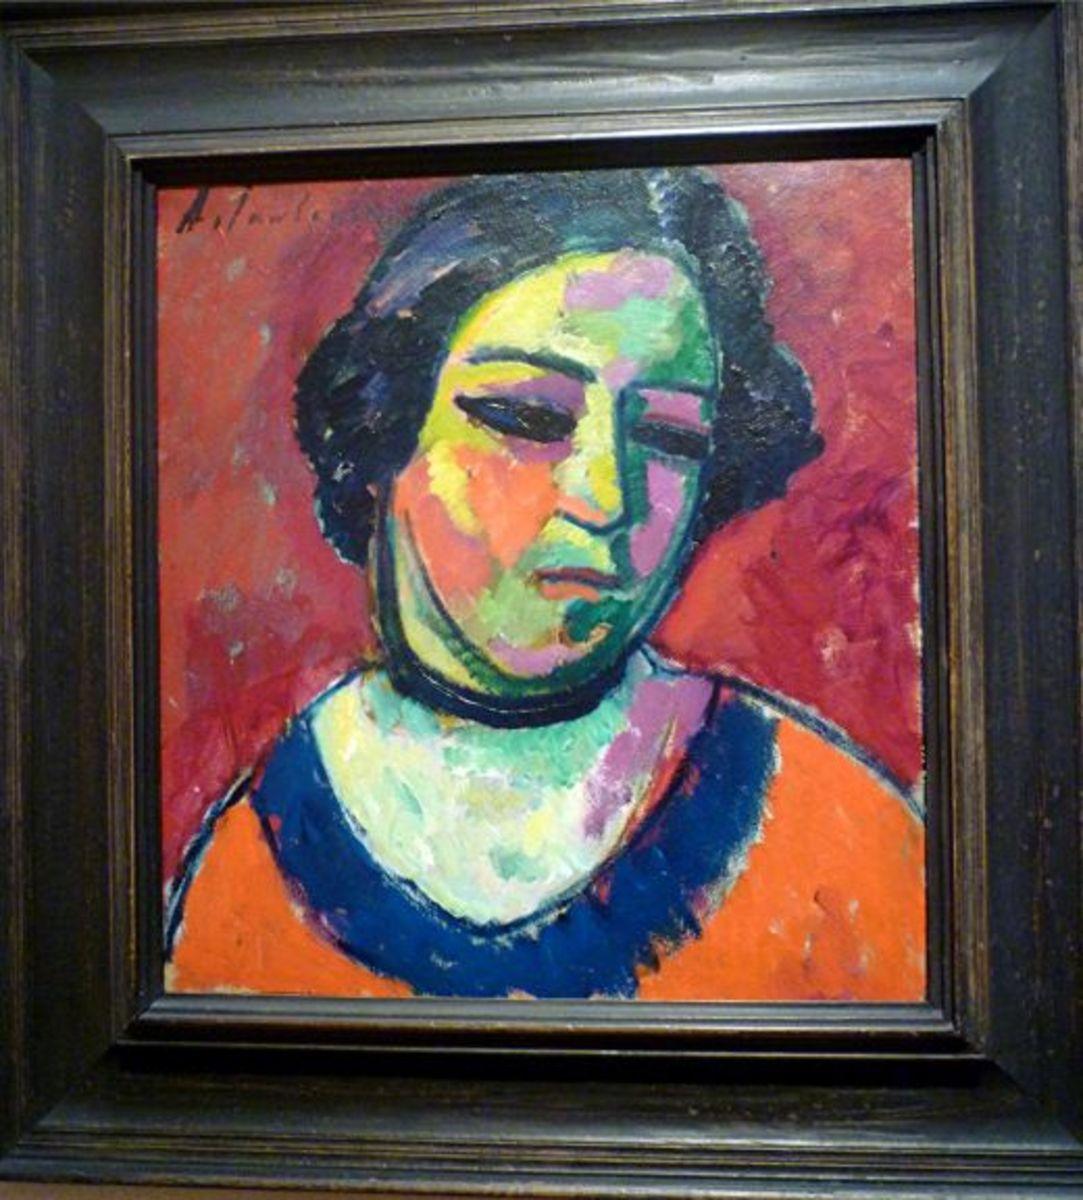 Portrait of a Woman by Alexei Jawlensky